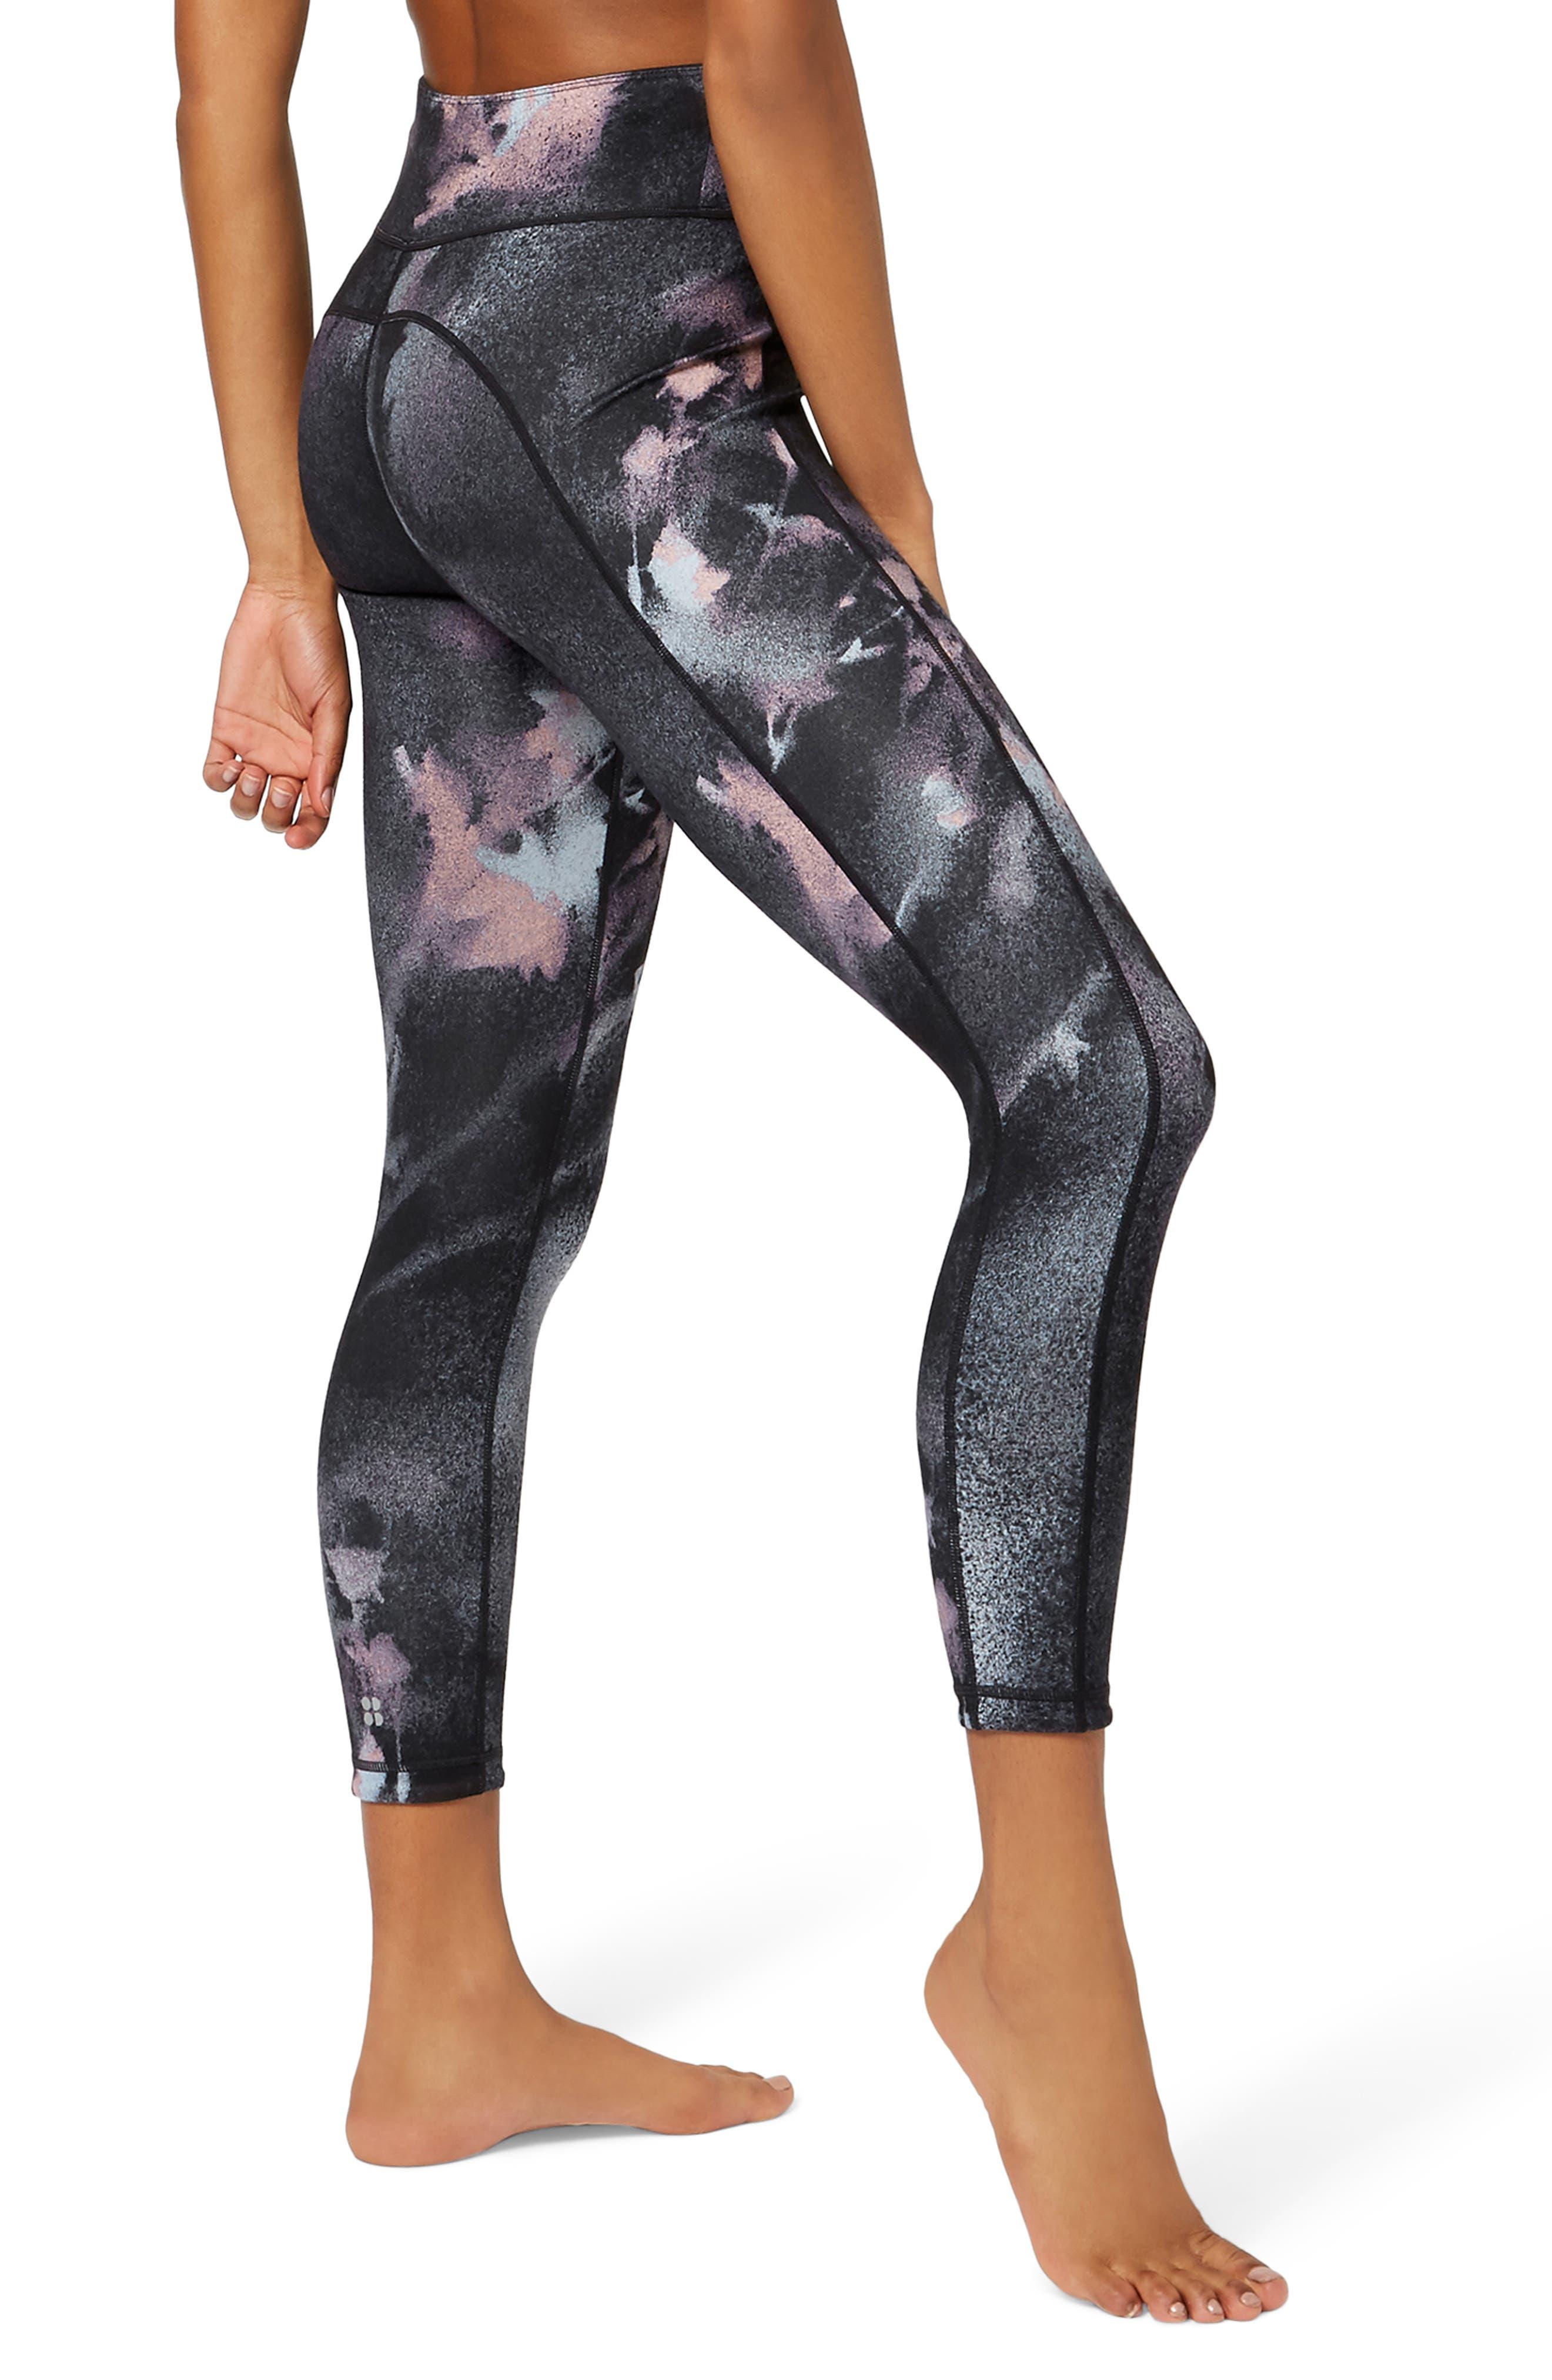 Double Duty Reversible Yoga Leggings,                             Alternate thumbnail 4, color,                             BLACK SPRAY PAINT FLORAL